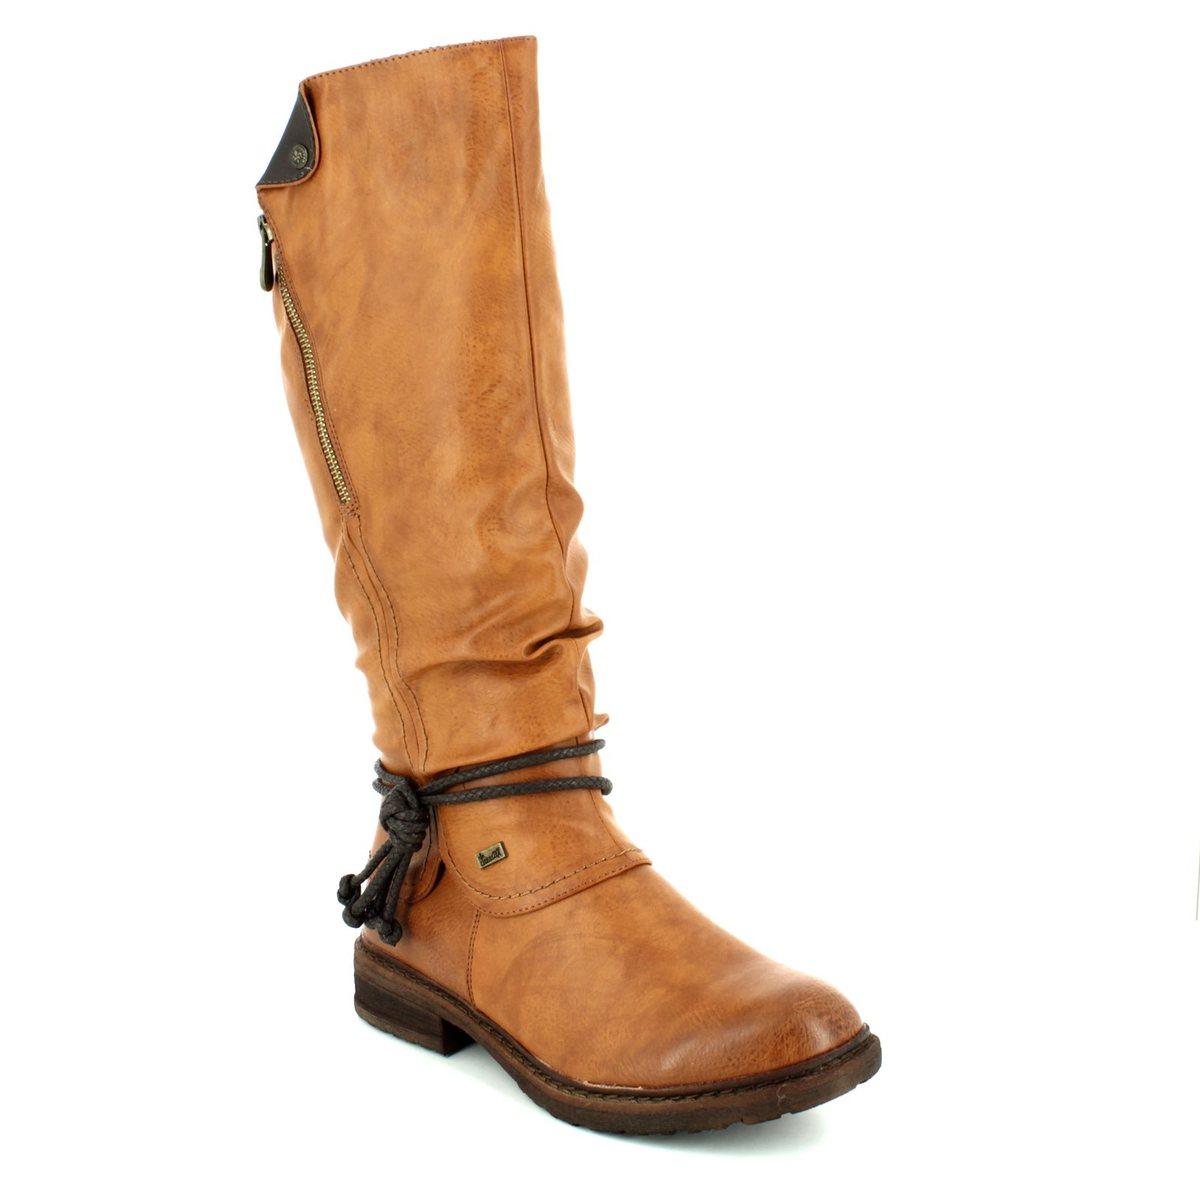 77ee294940 Rieker Knee-high Boots - Tan - 94758-24 FRESCO TEX